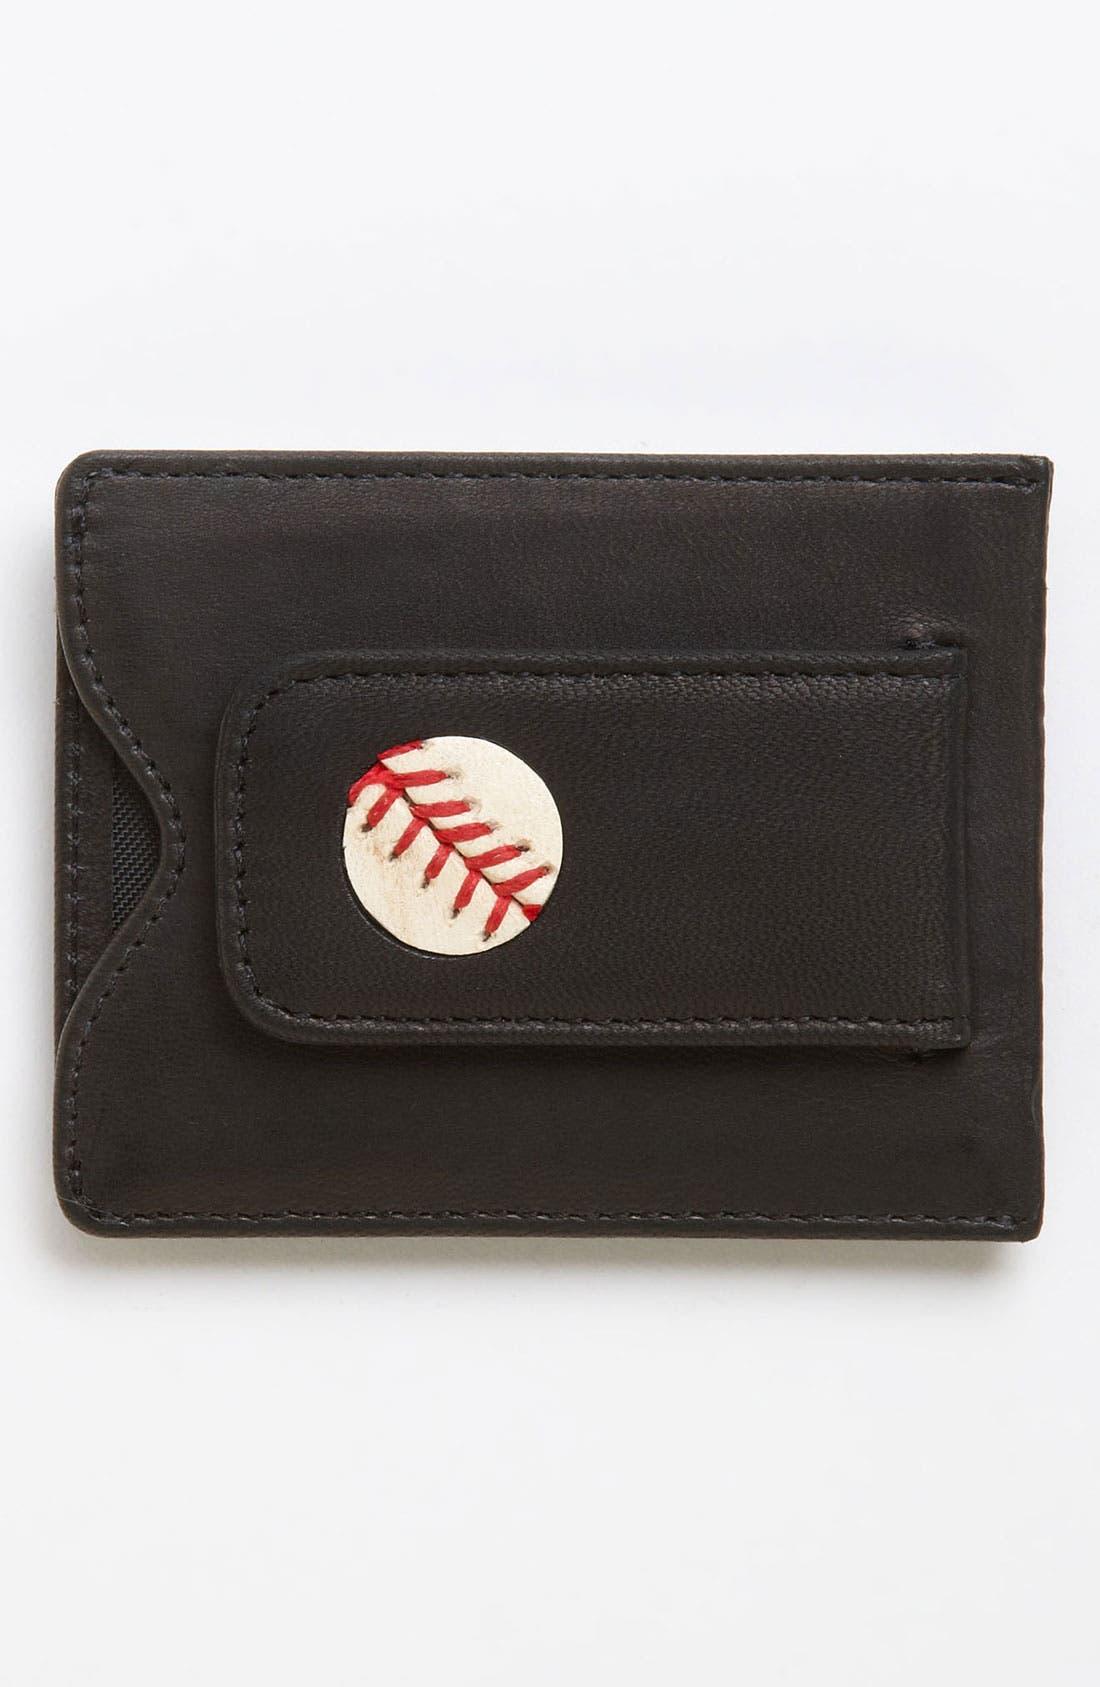 Alternate Image 1 Selected - Tokens & Icons 'Washington Nationals' MLB™ Game-Played-Baseball Card Case